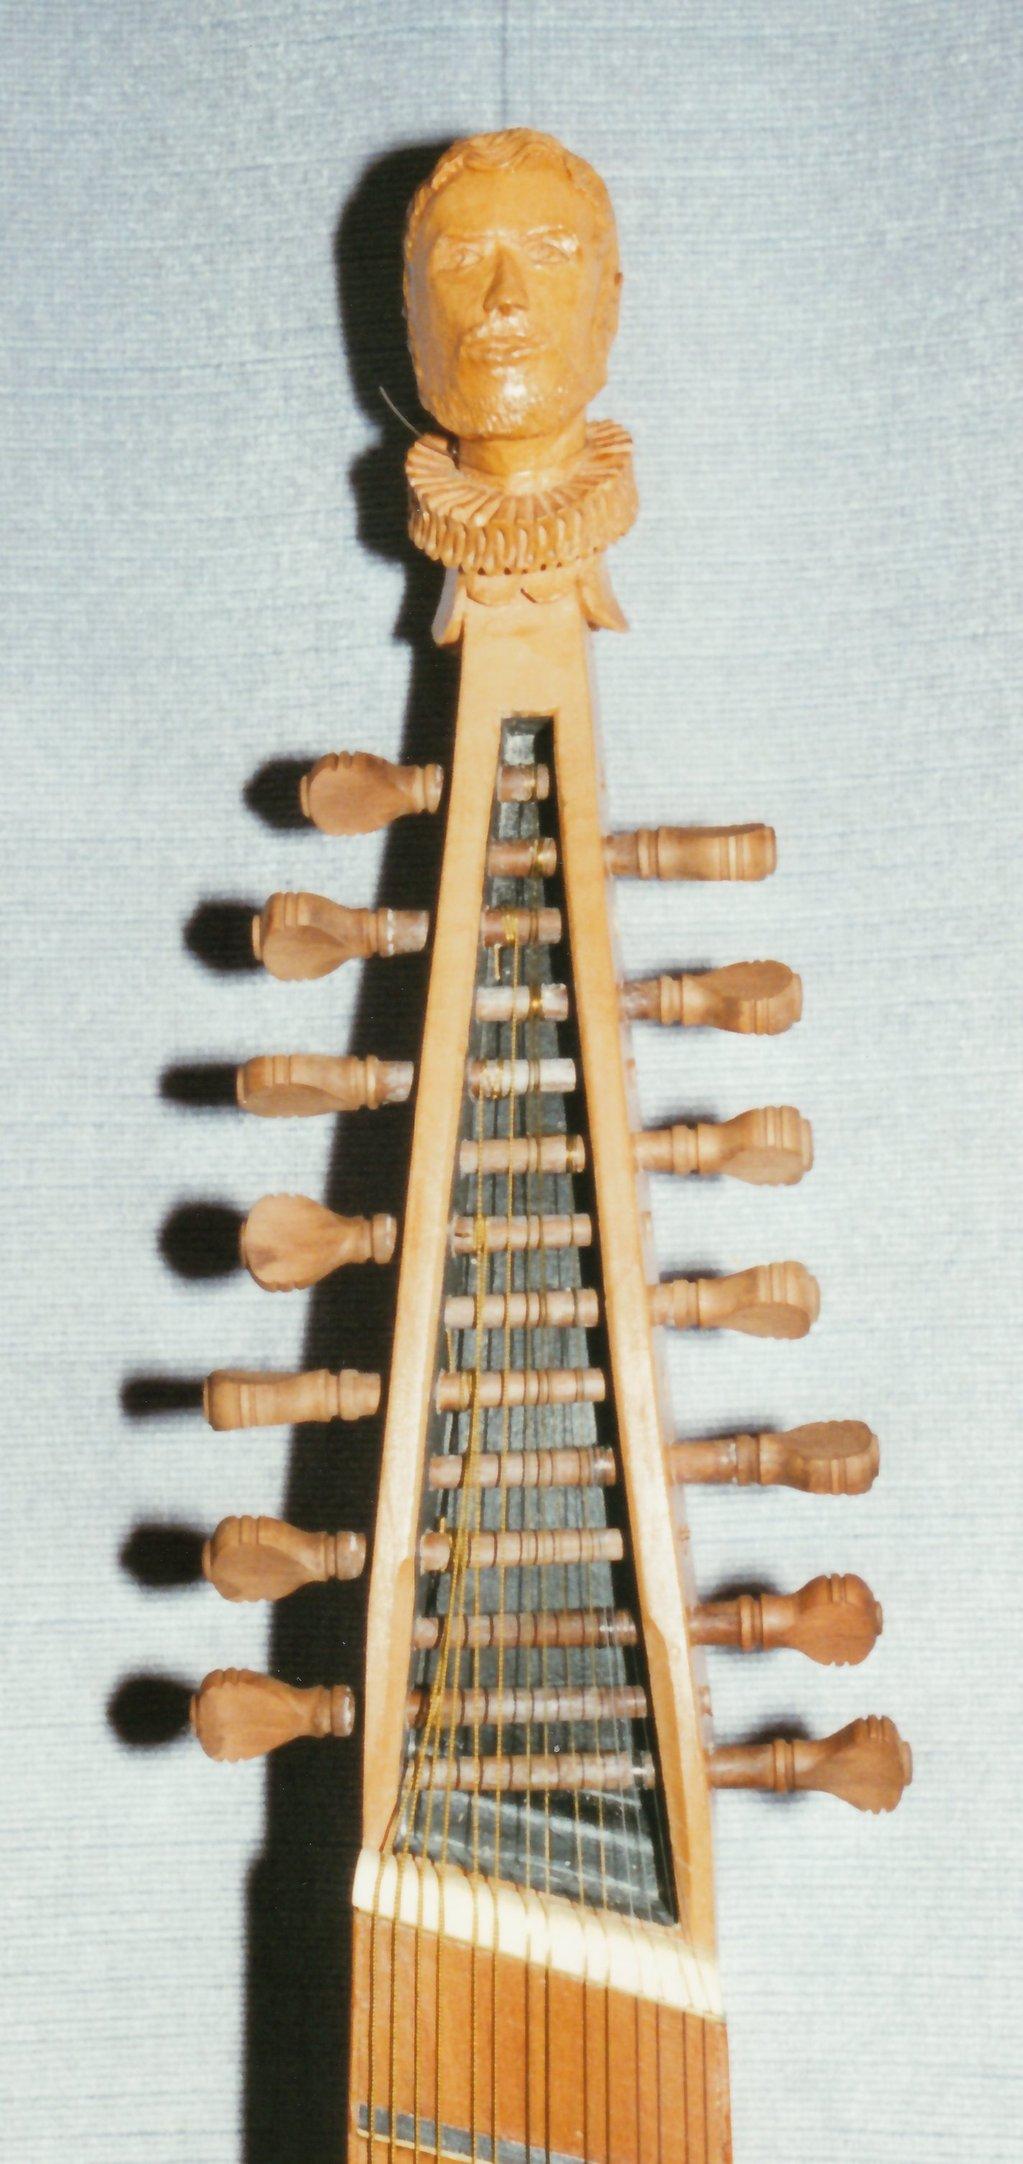 Fabrication d'instruments de musique anciens de bgire - Page 2 EEr6Ib-1994-Orpharion-77